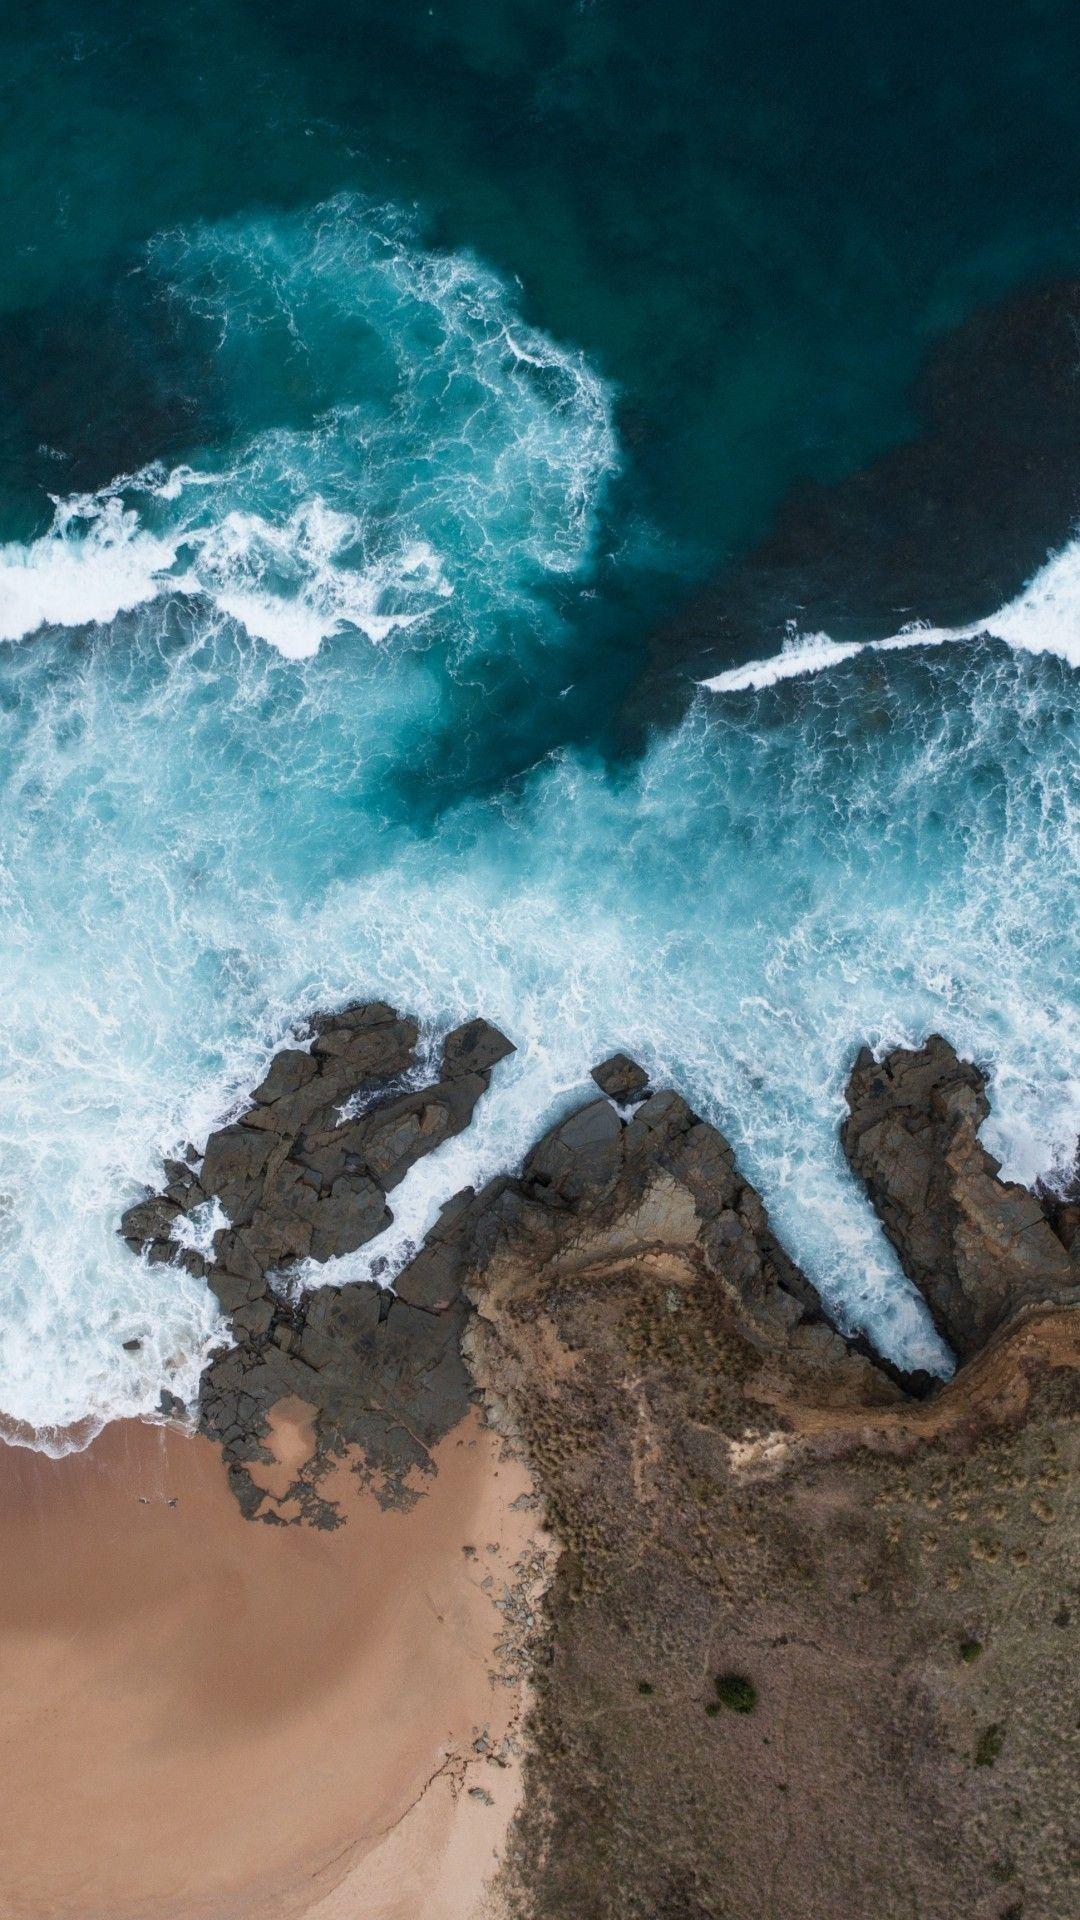 Ocean Waves wallpaper iphone